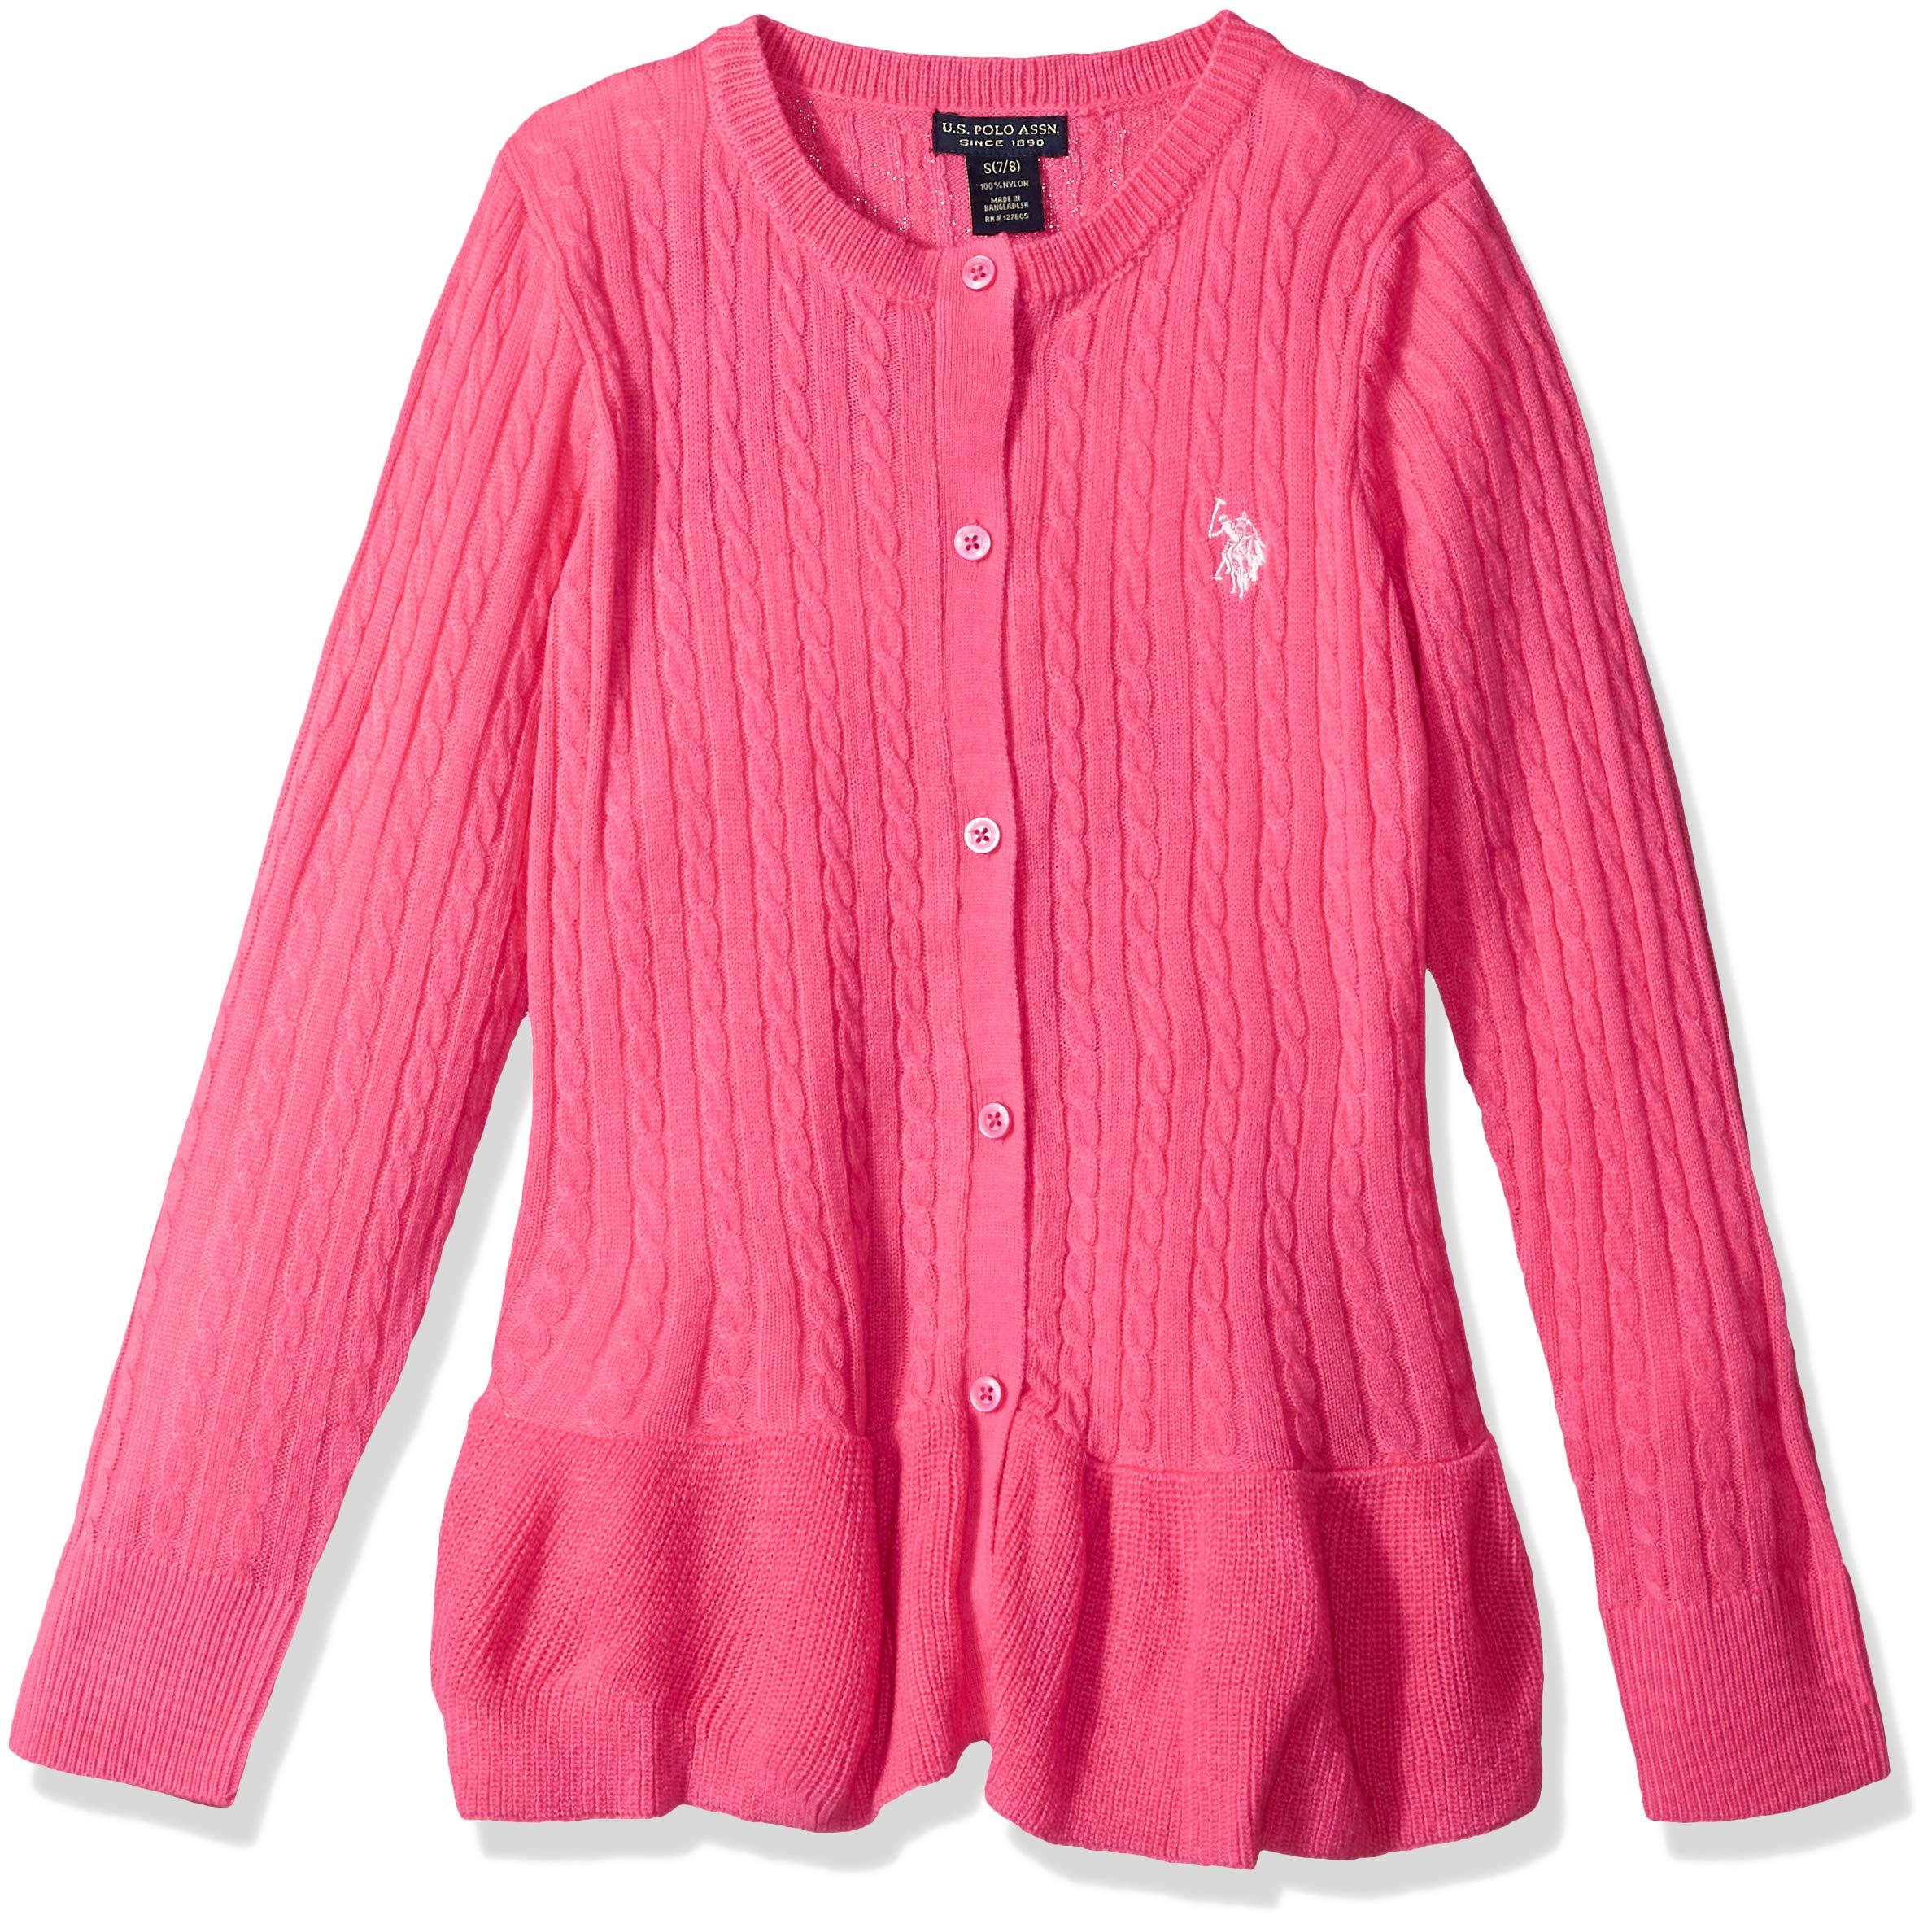 U.S. Polo Assn. Girls' Big Pullover Sweater, as Cable Cardi Medium Pink, 10/12